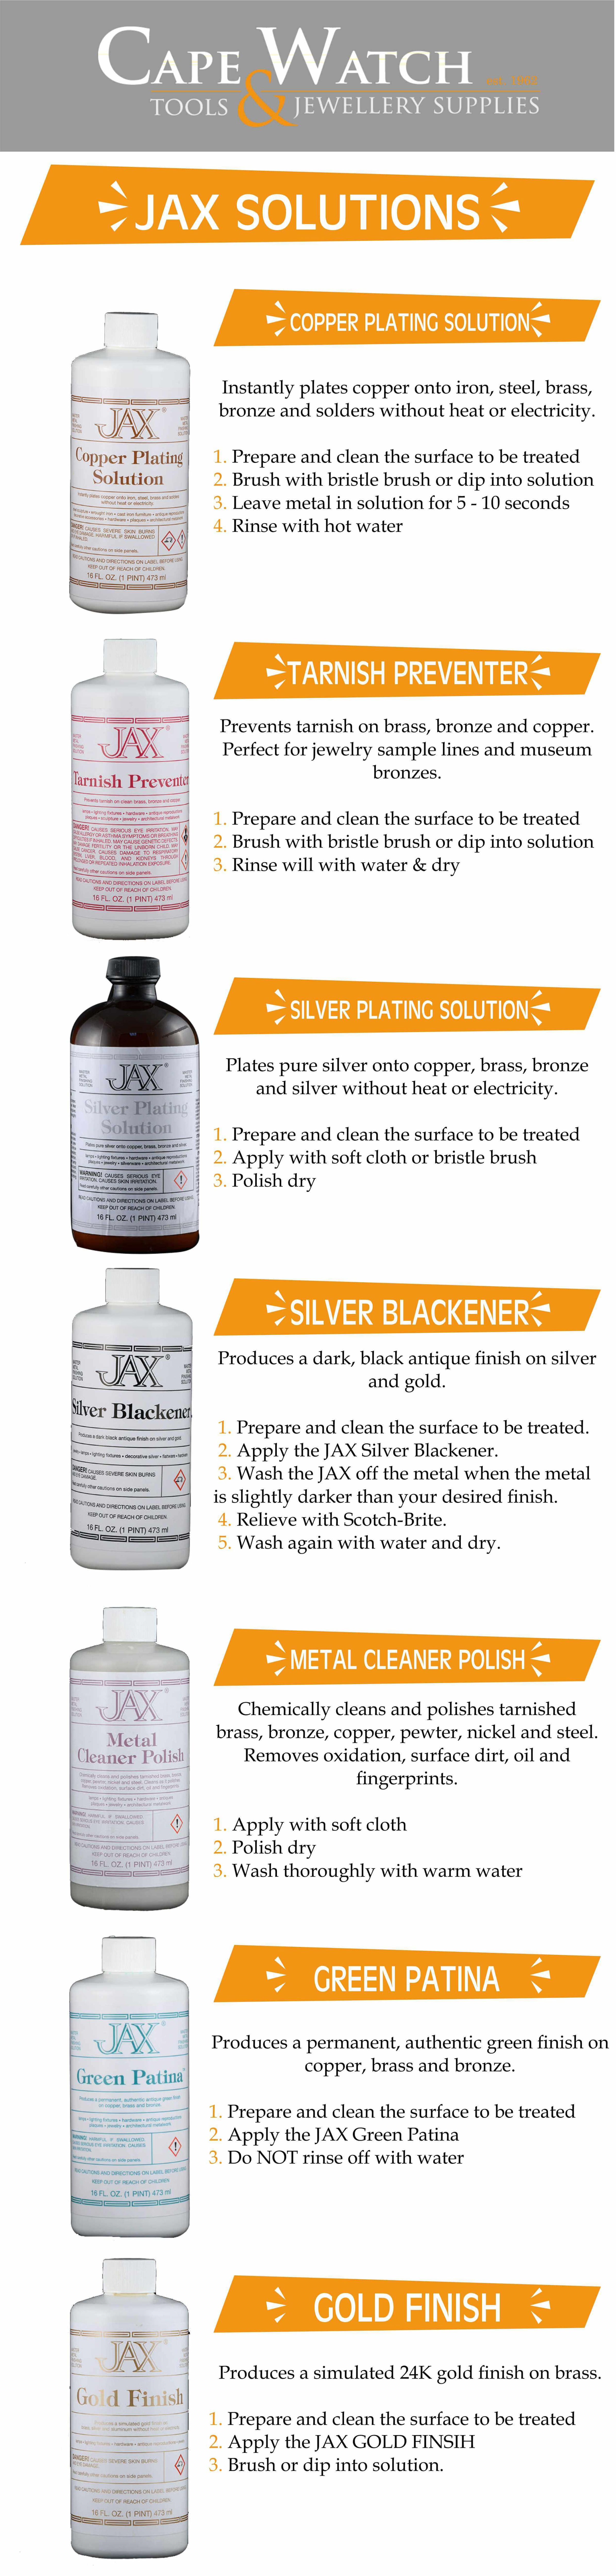 JAX Master Finishing Solutions